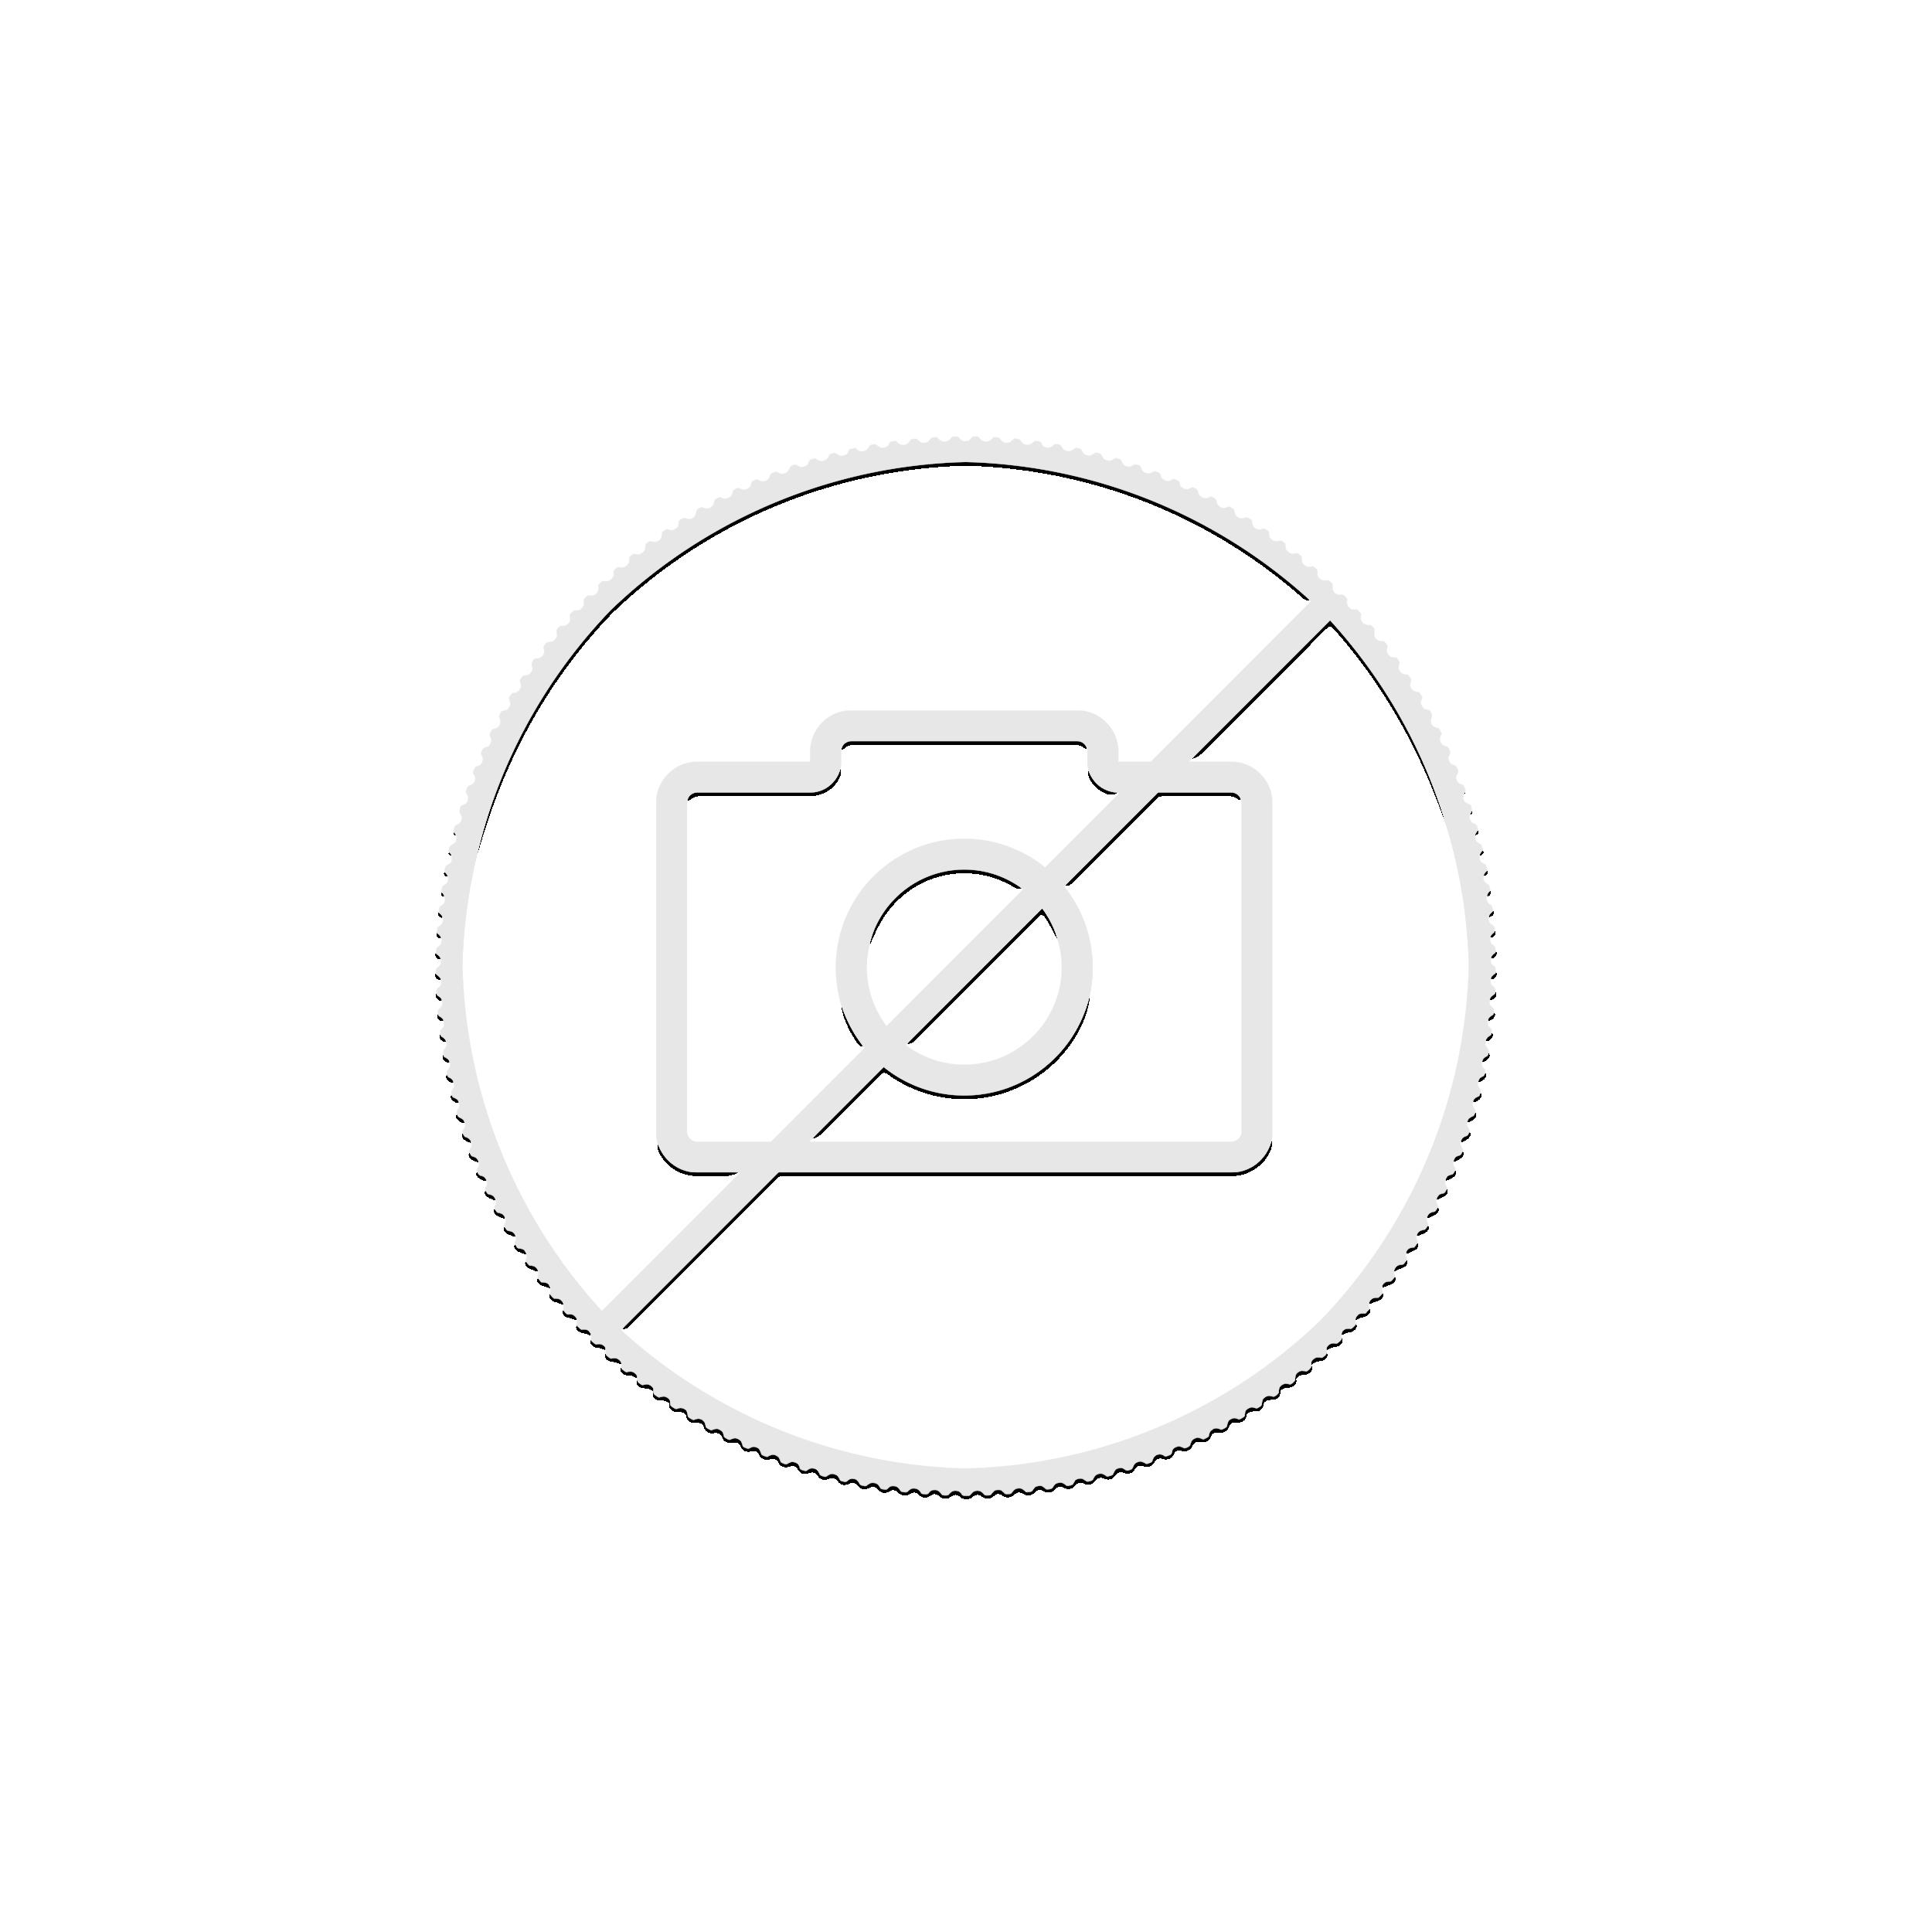 1 Kilo gouden munt Kangaroo 2021